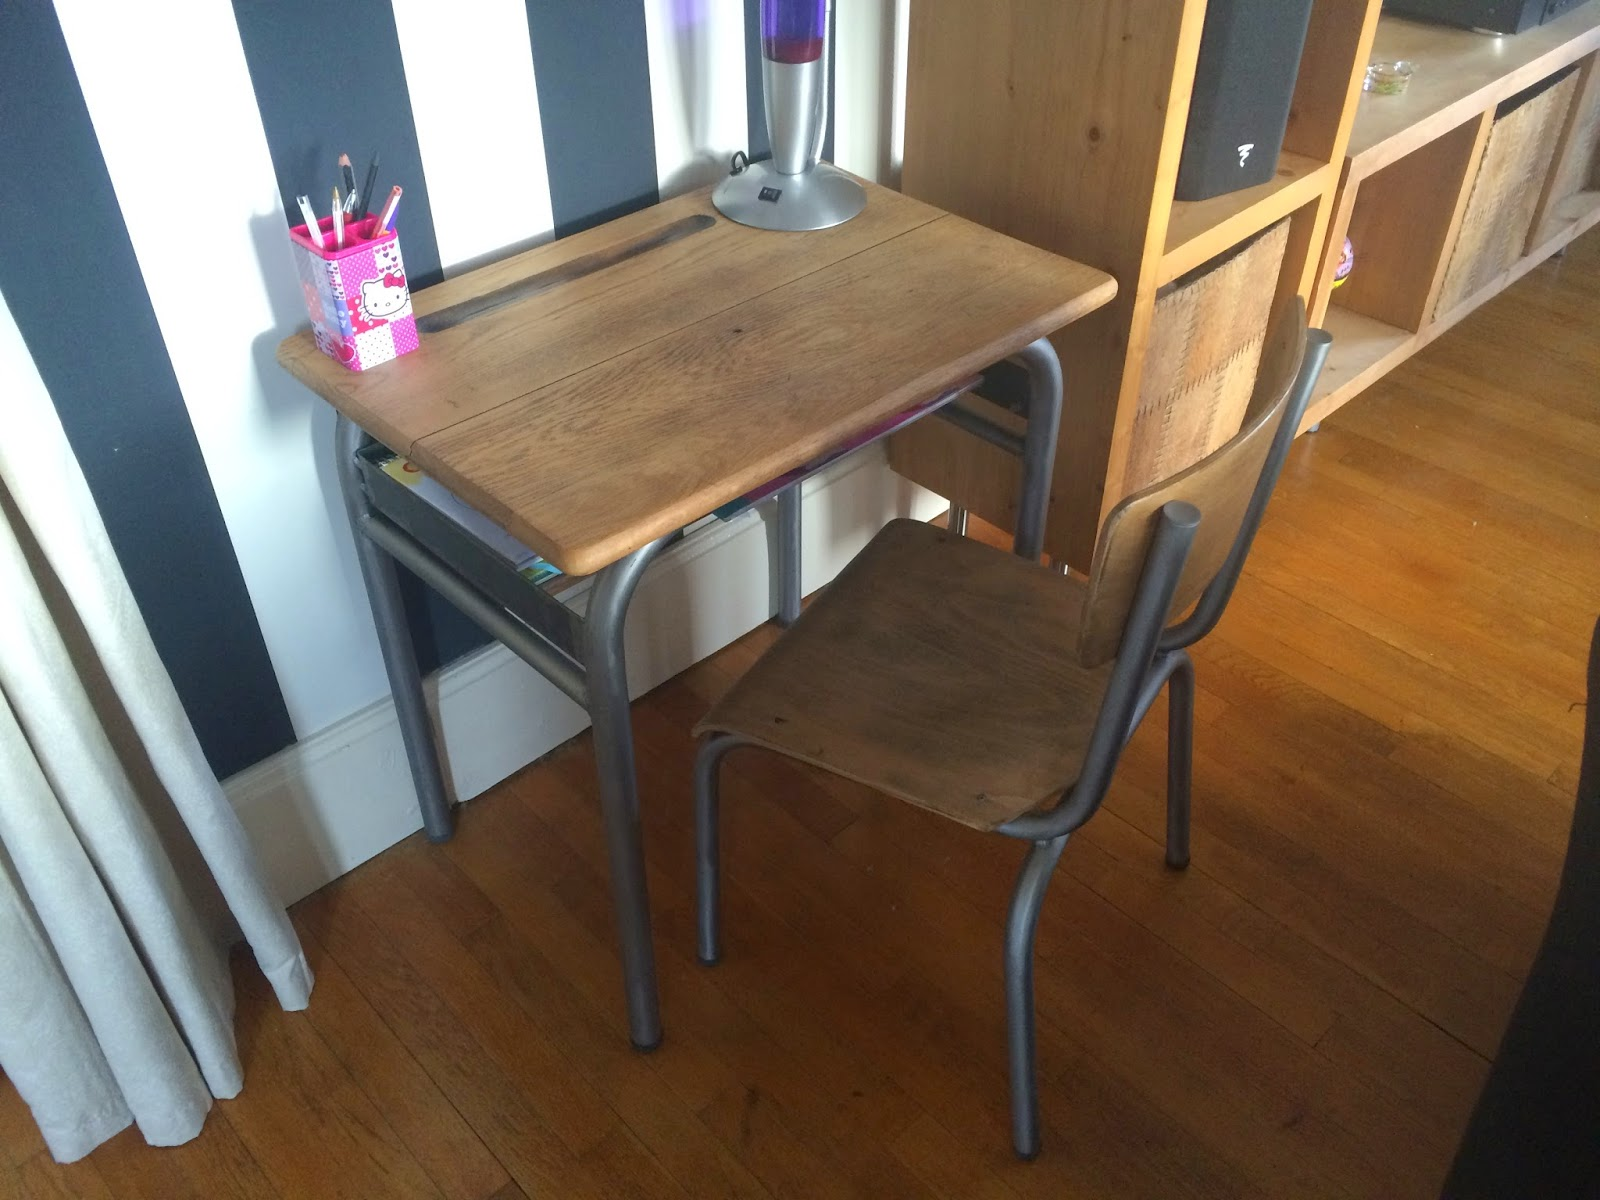 johndoemotorcycles table d 39 colier la suite. Black Bedroom Furniture Sets. Home Design Ideas